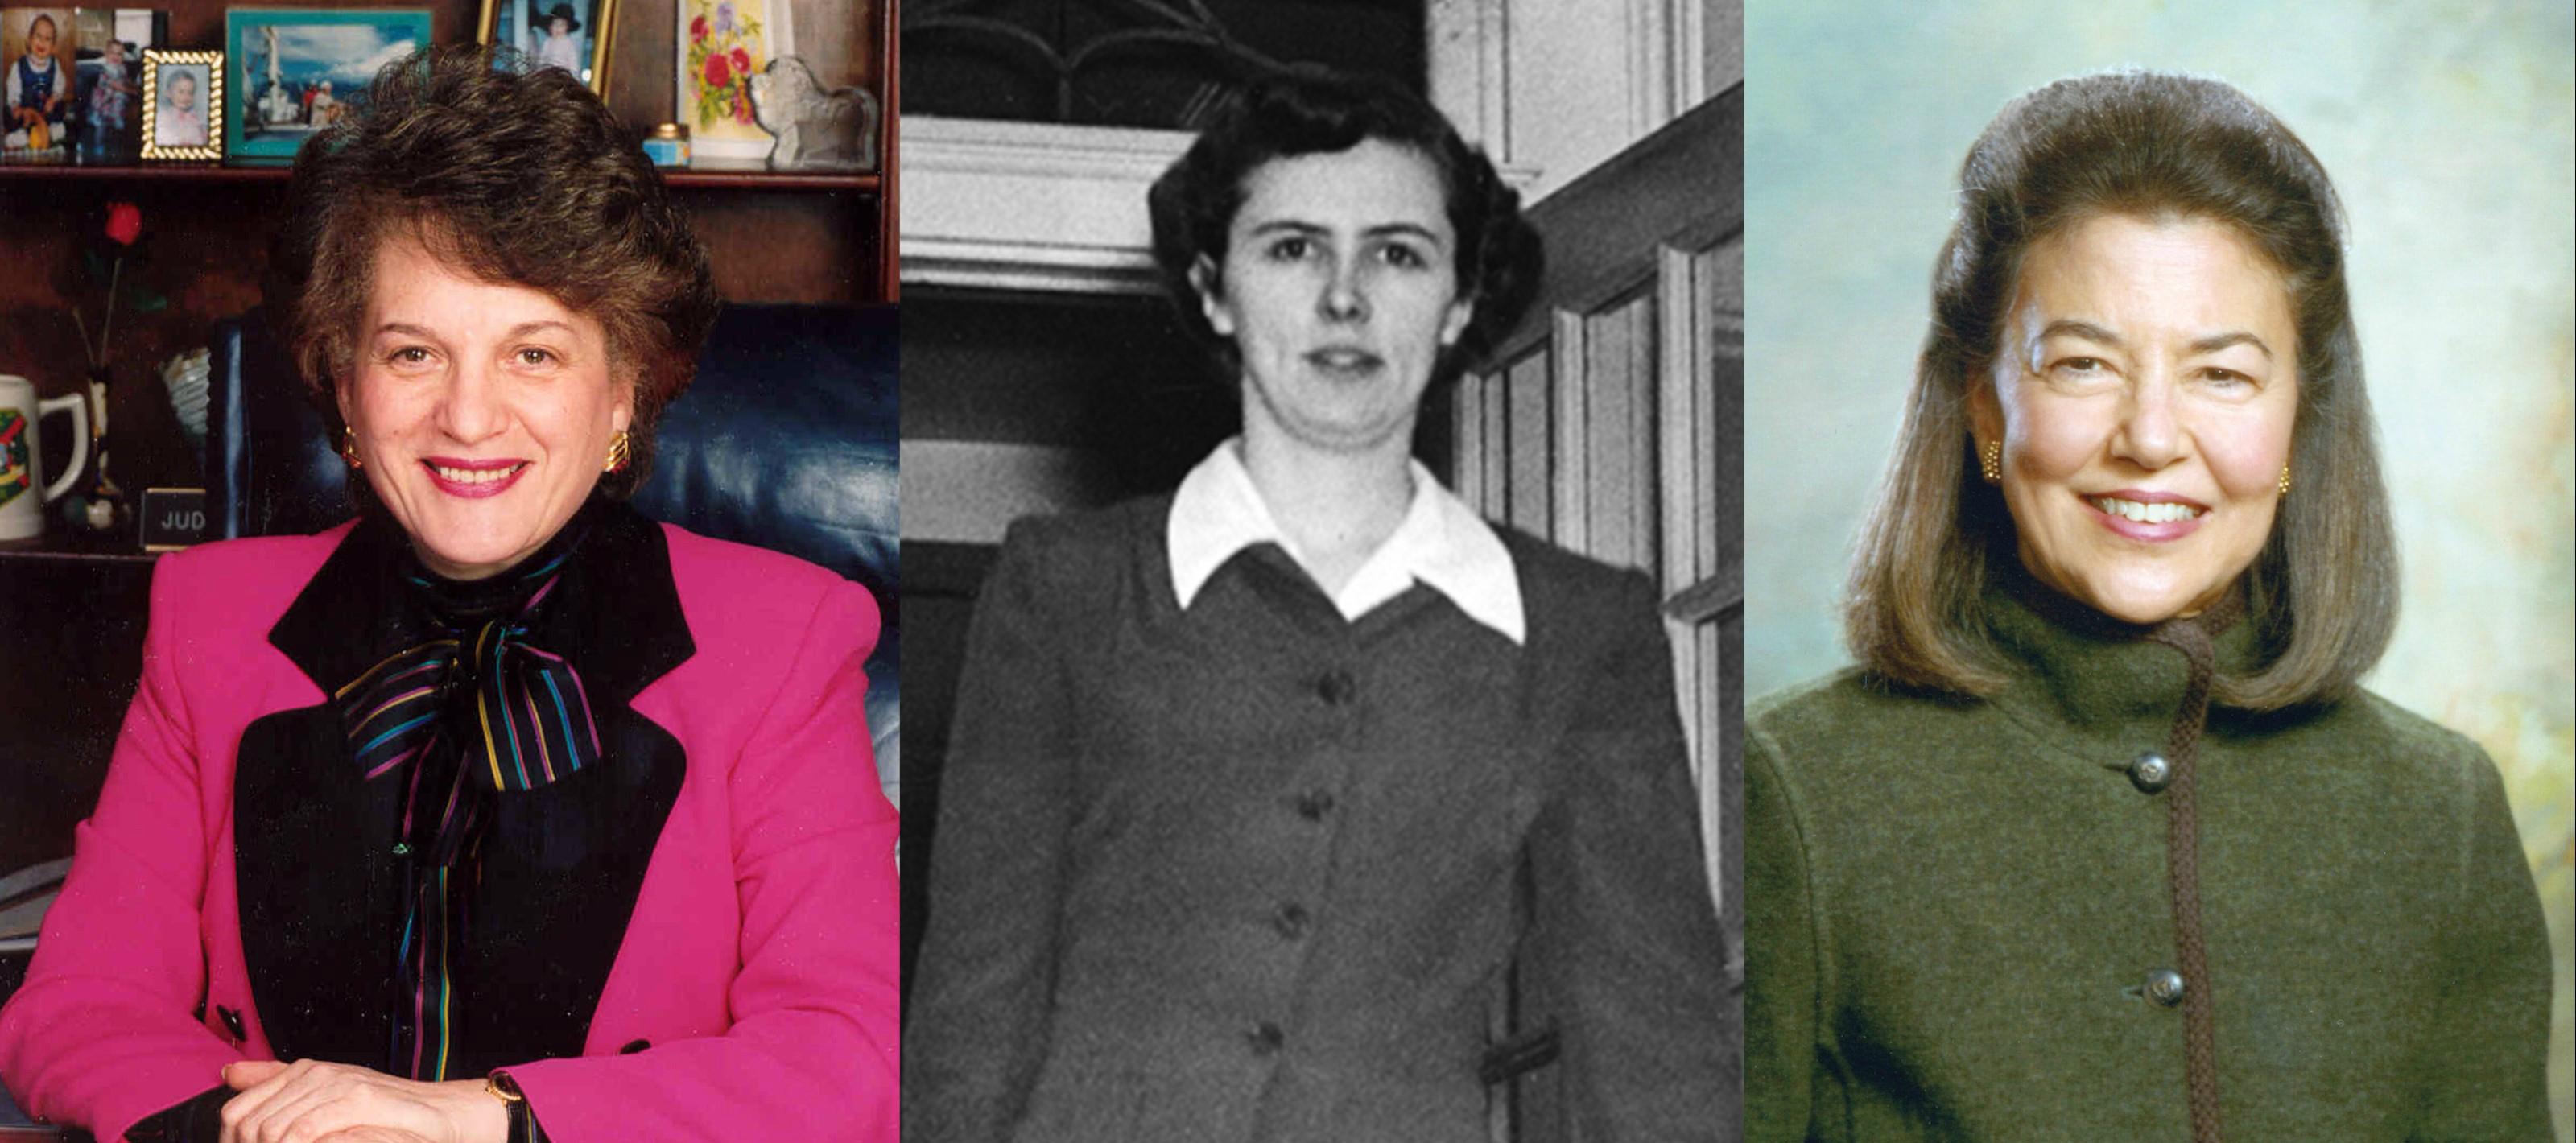 Hon. Judith S. Kaye, Charlotte Smallwood-Cook, and Helaine M. Barnett